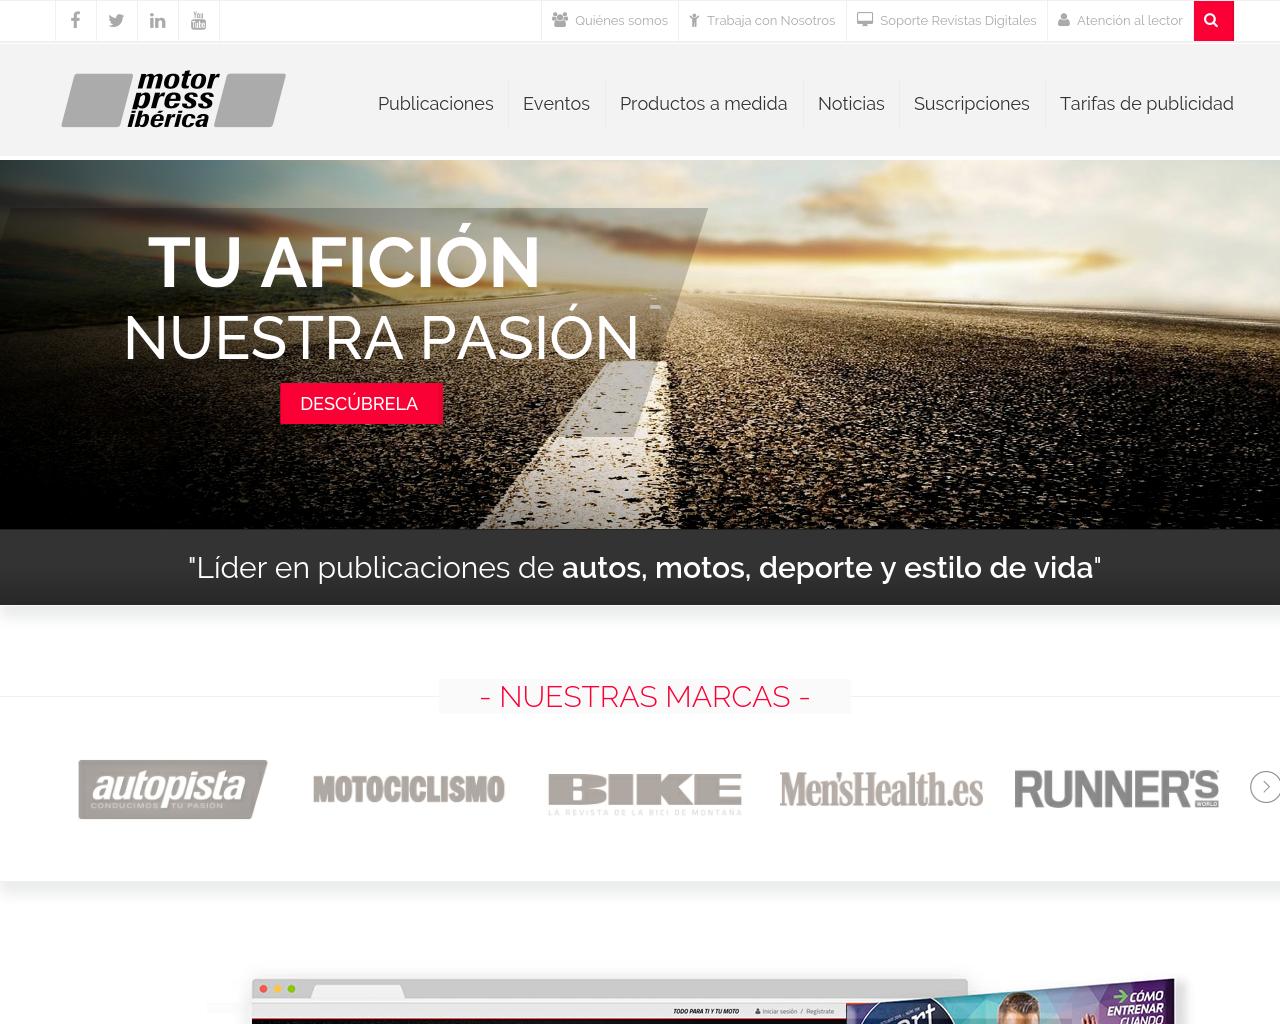 Motorpress-Ibérica-Advertising-Reviews-Pricing